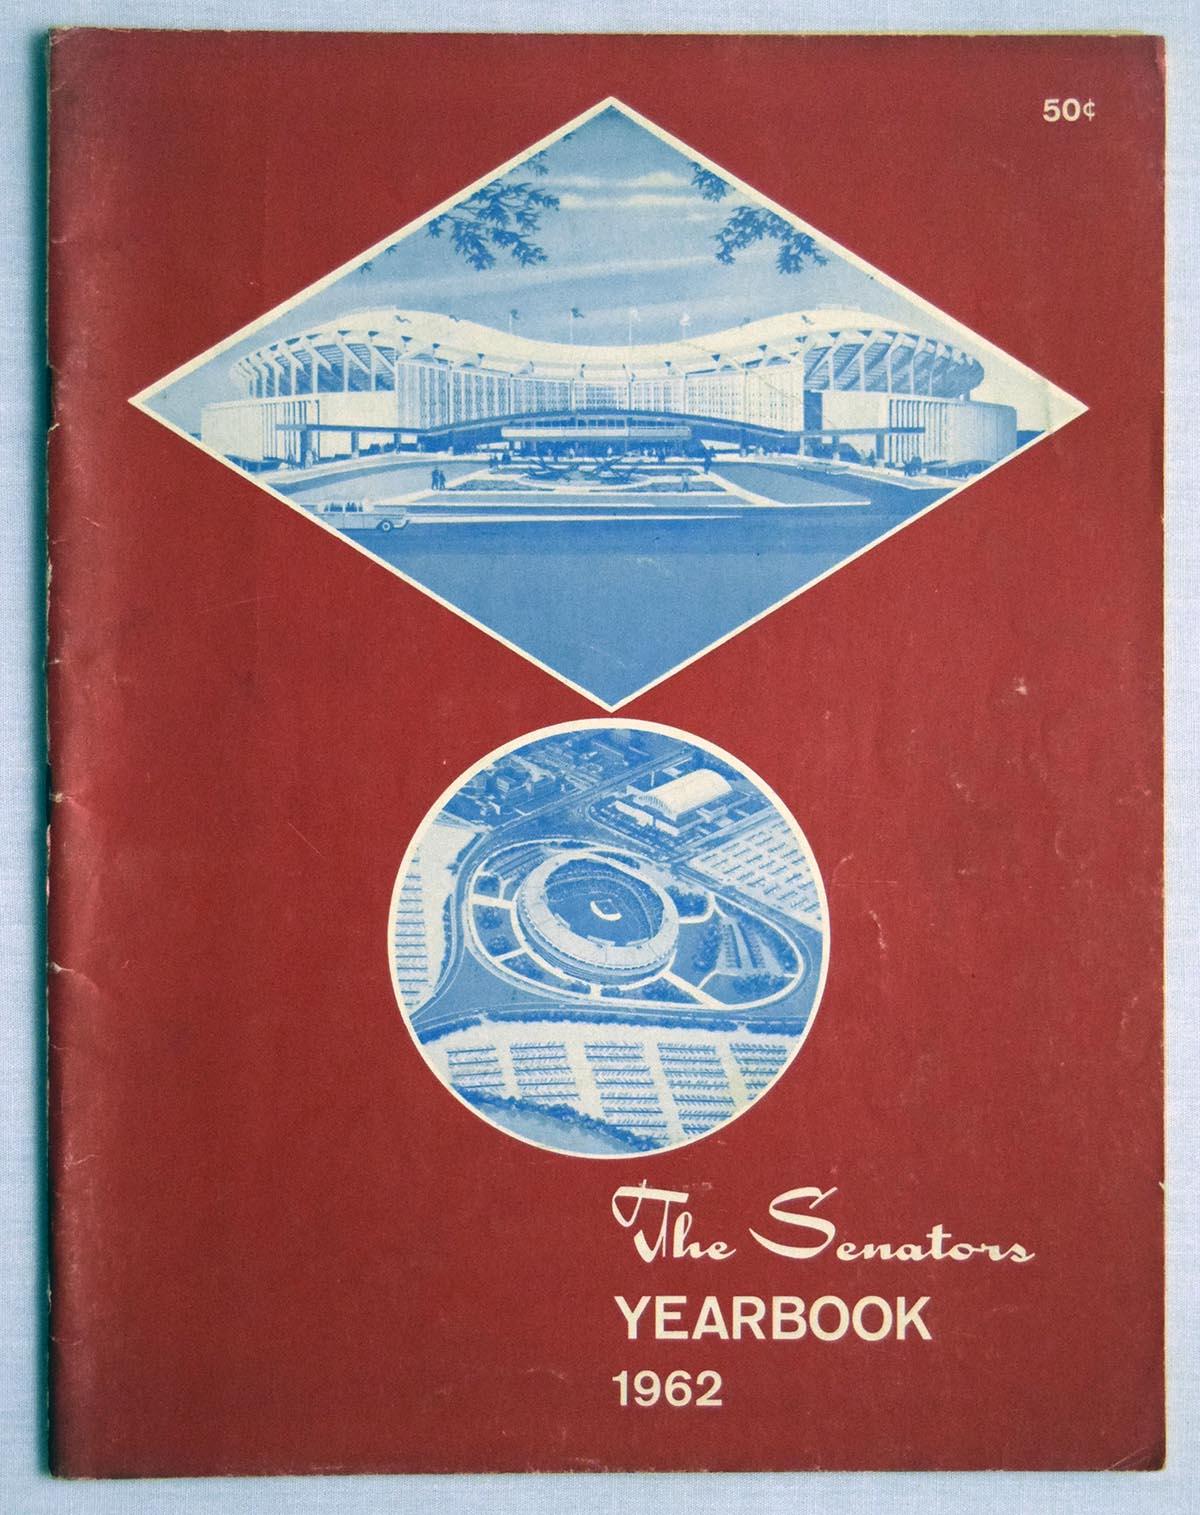 Lot #1745 1962 Yearbook  Washington Senators Cond: Ex+